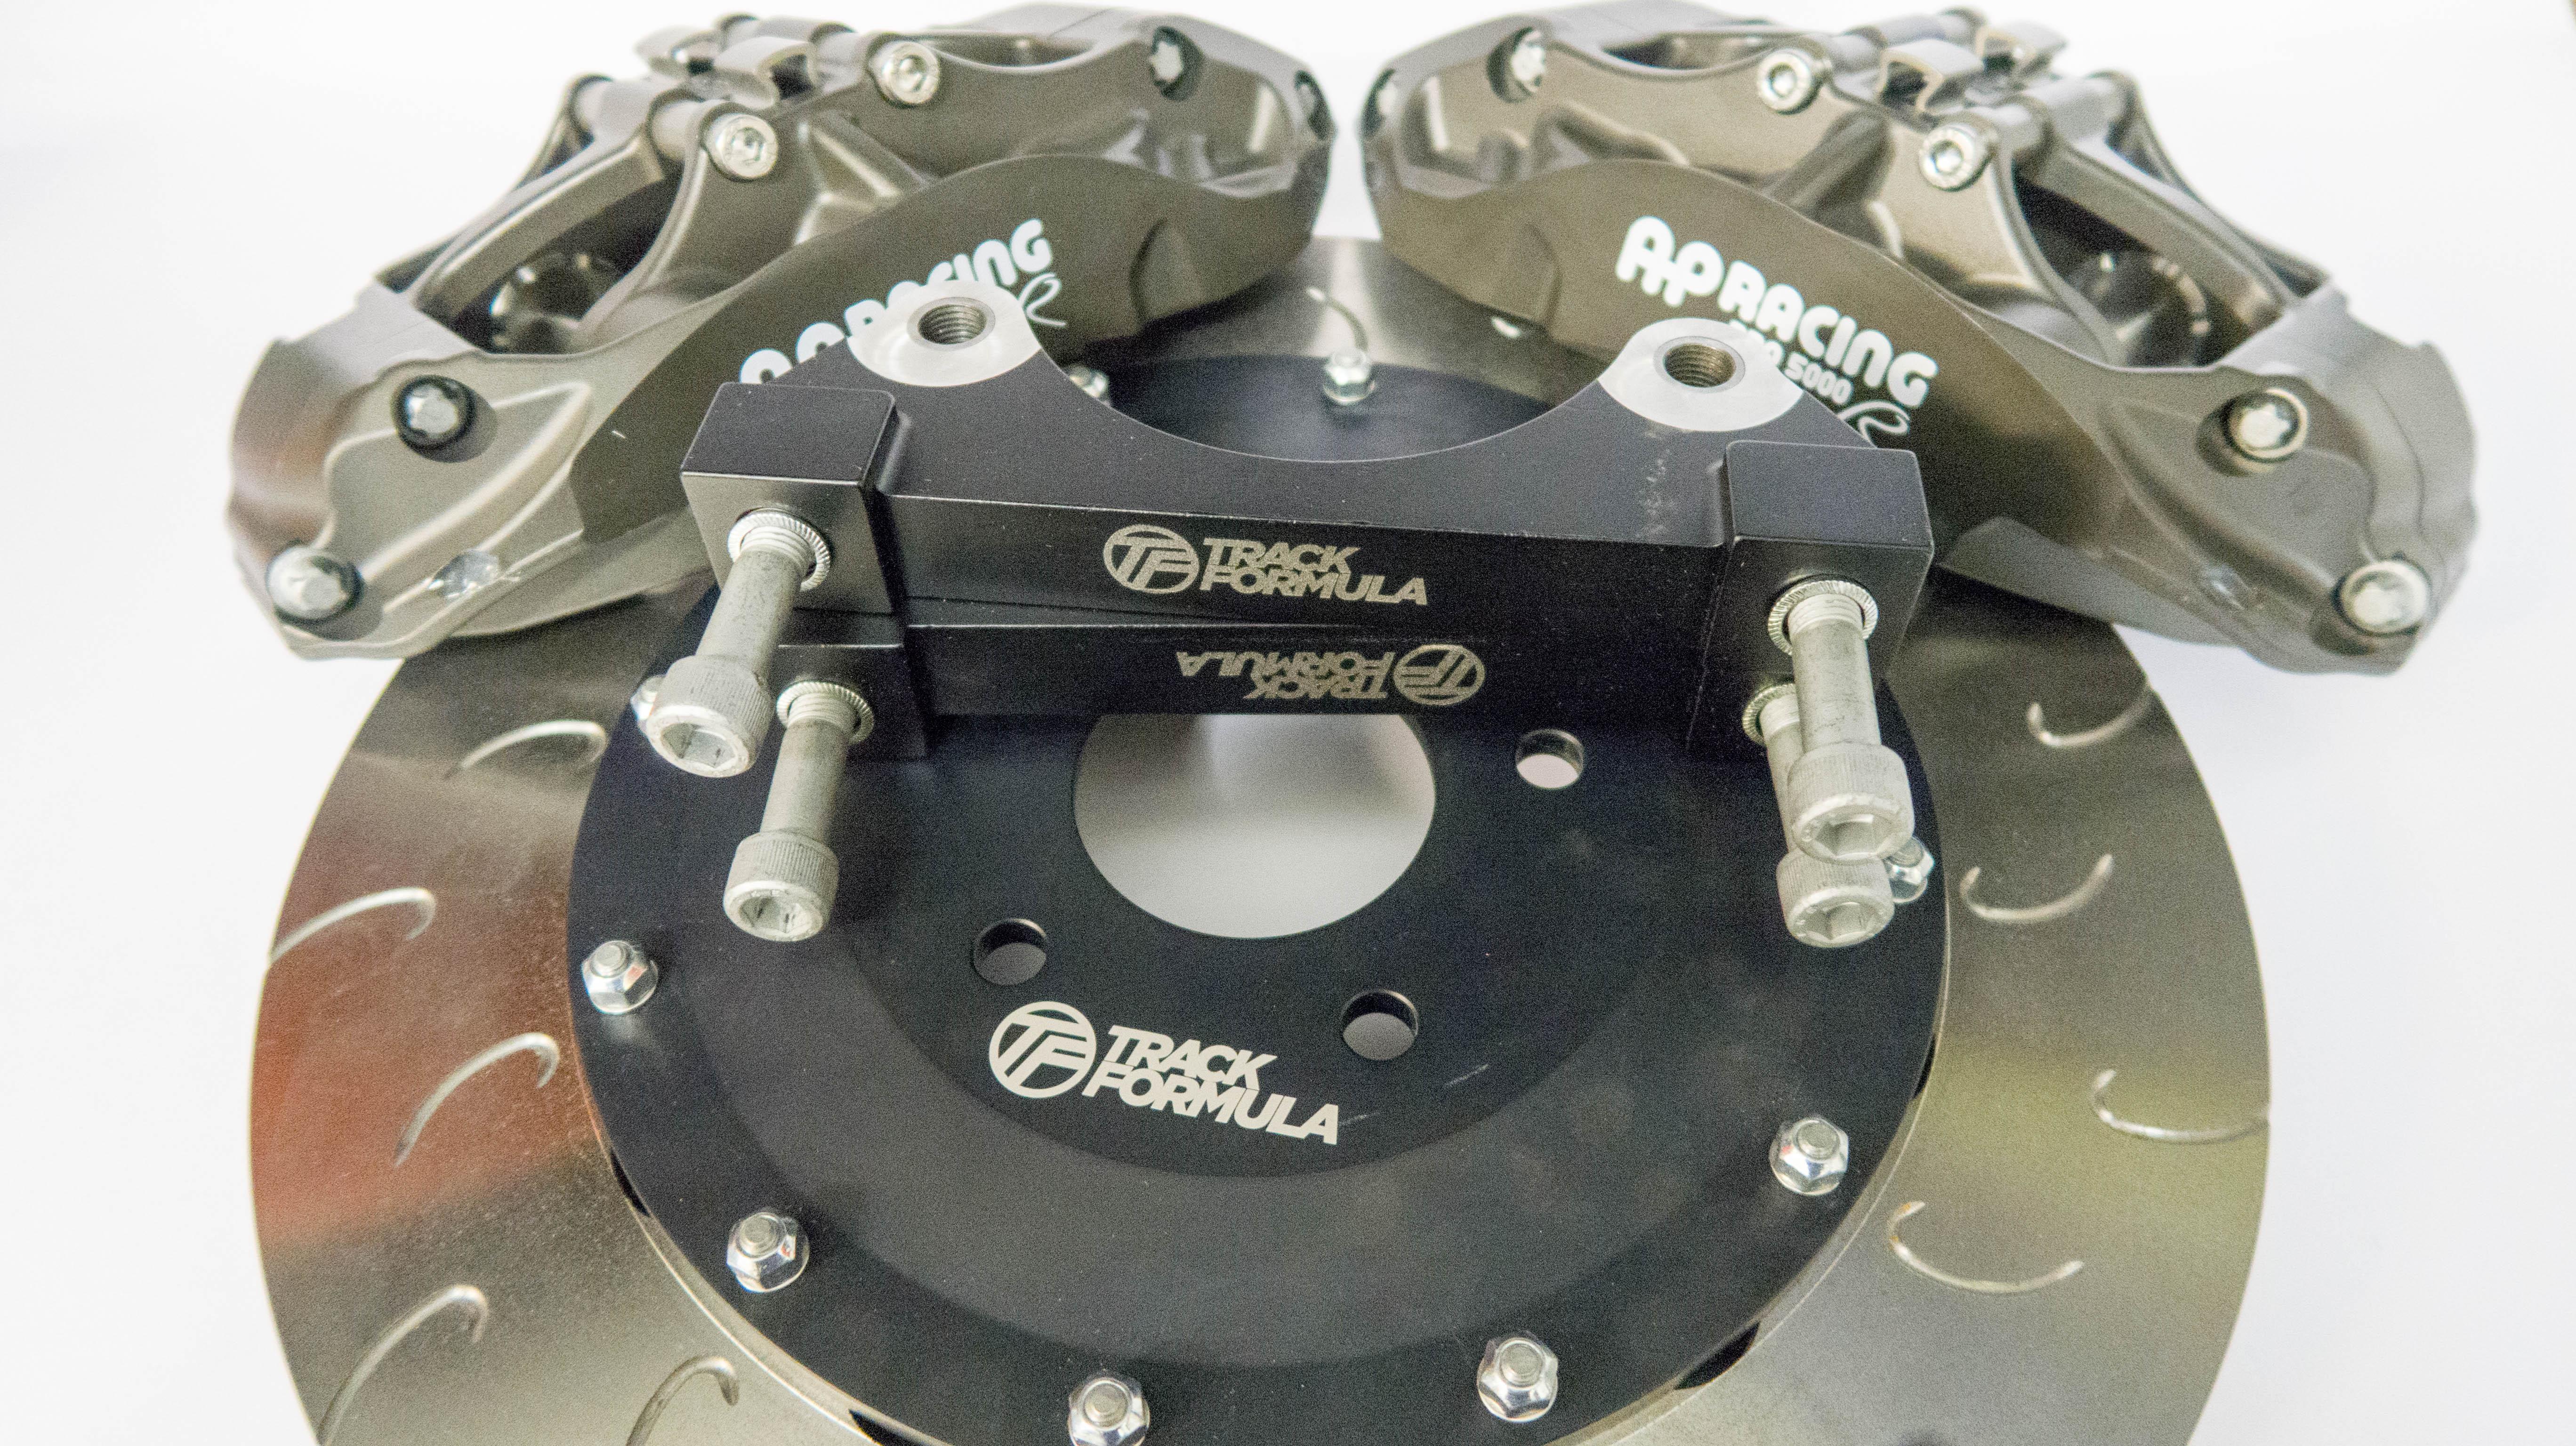 Nissan Skyline R32, R33 & R34 GTR AP Racing Front Brake Kit